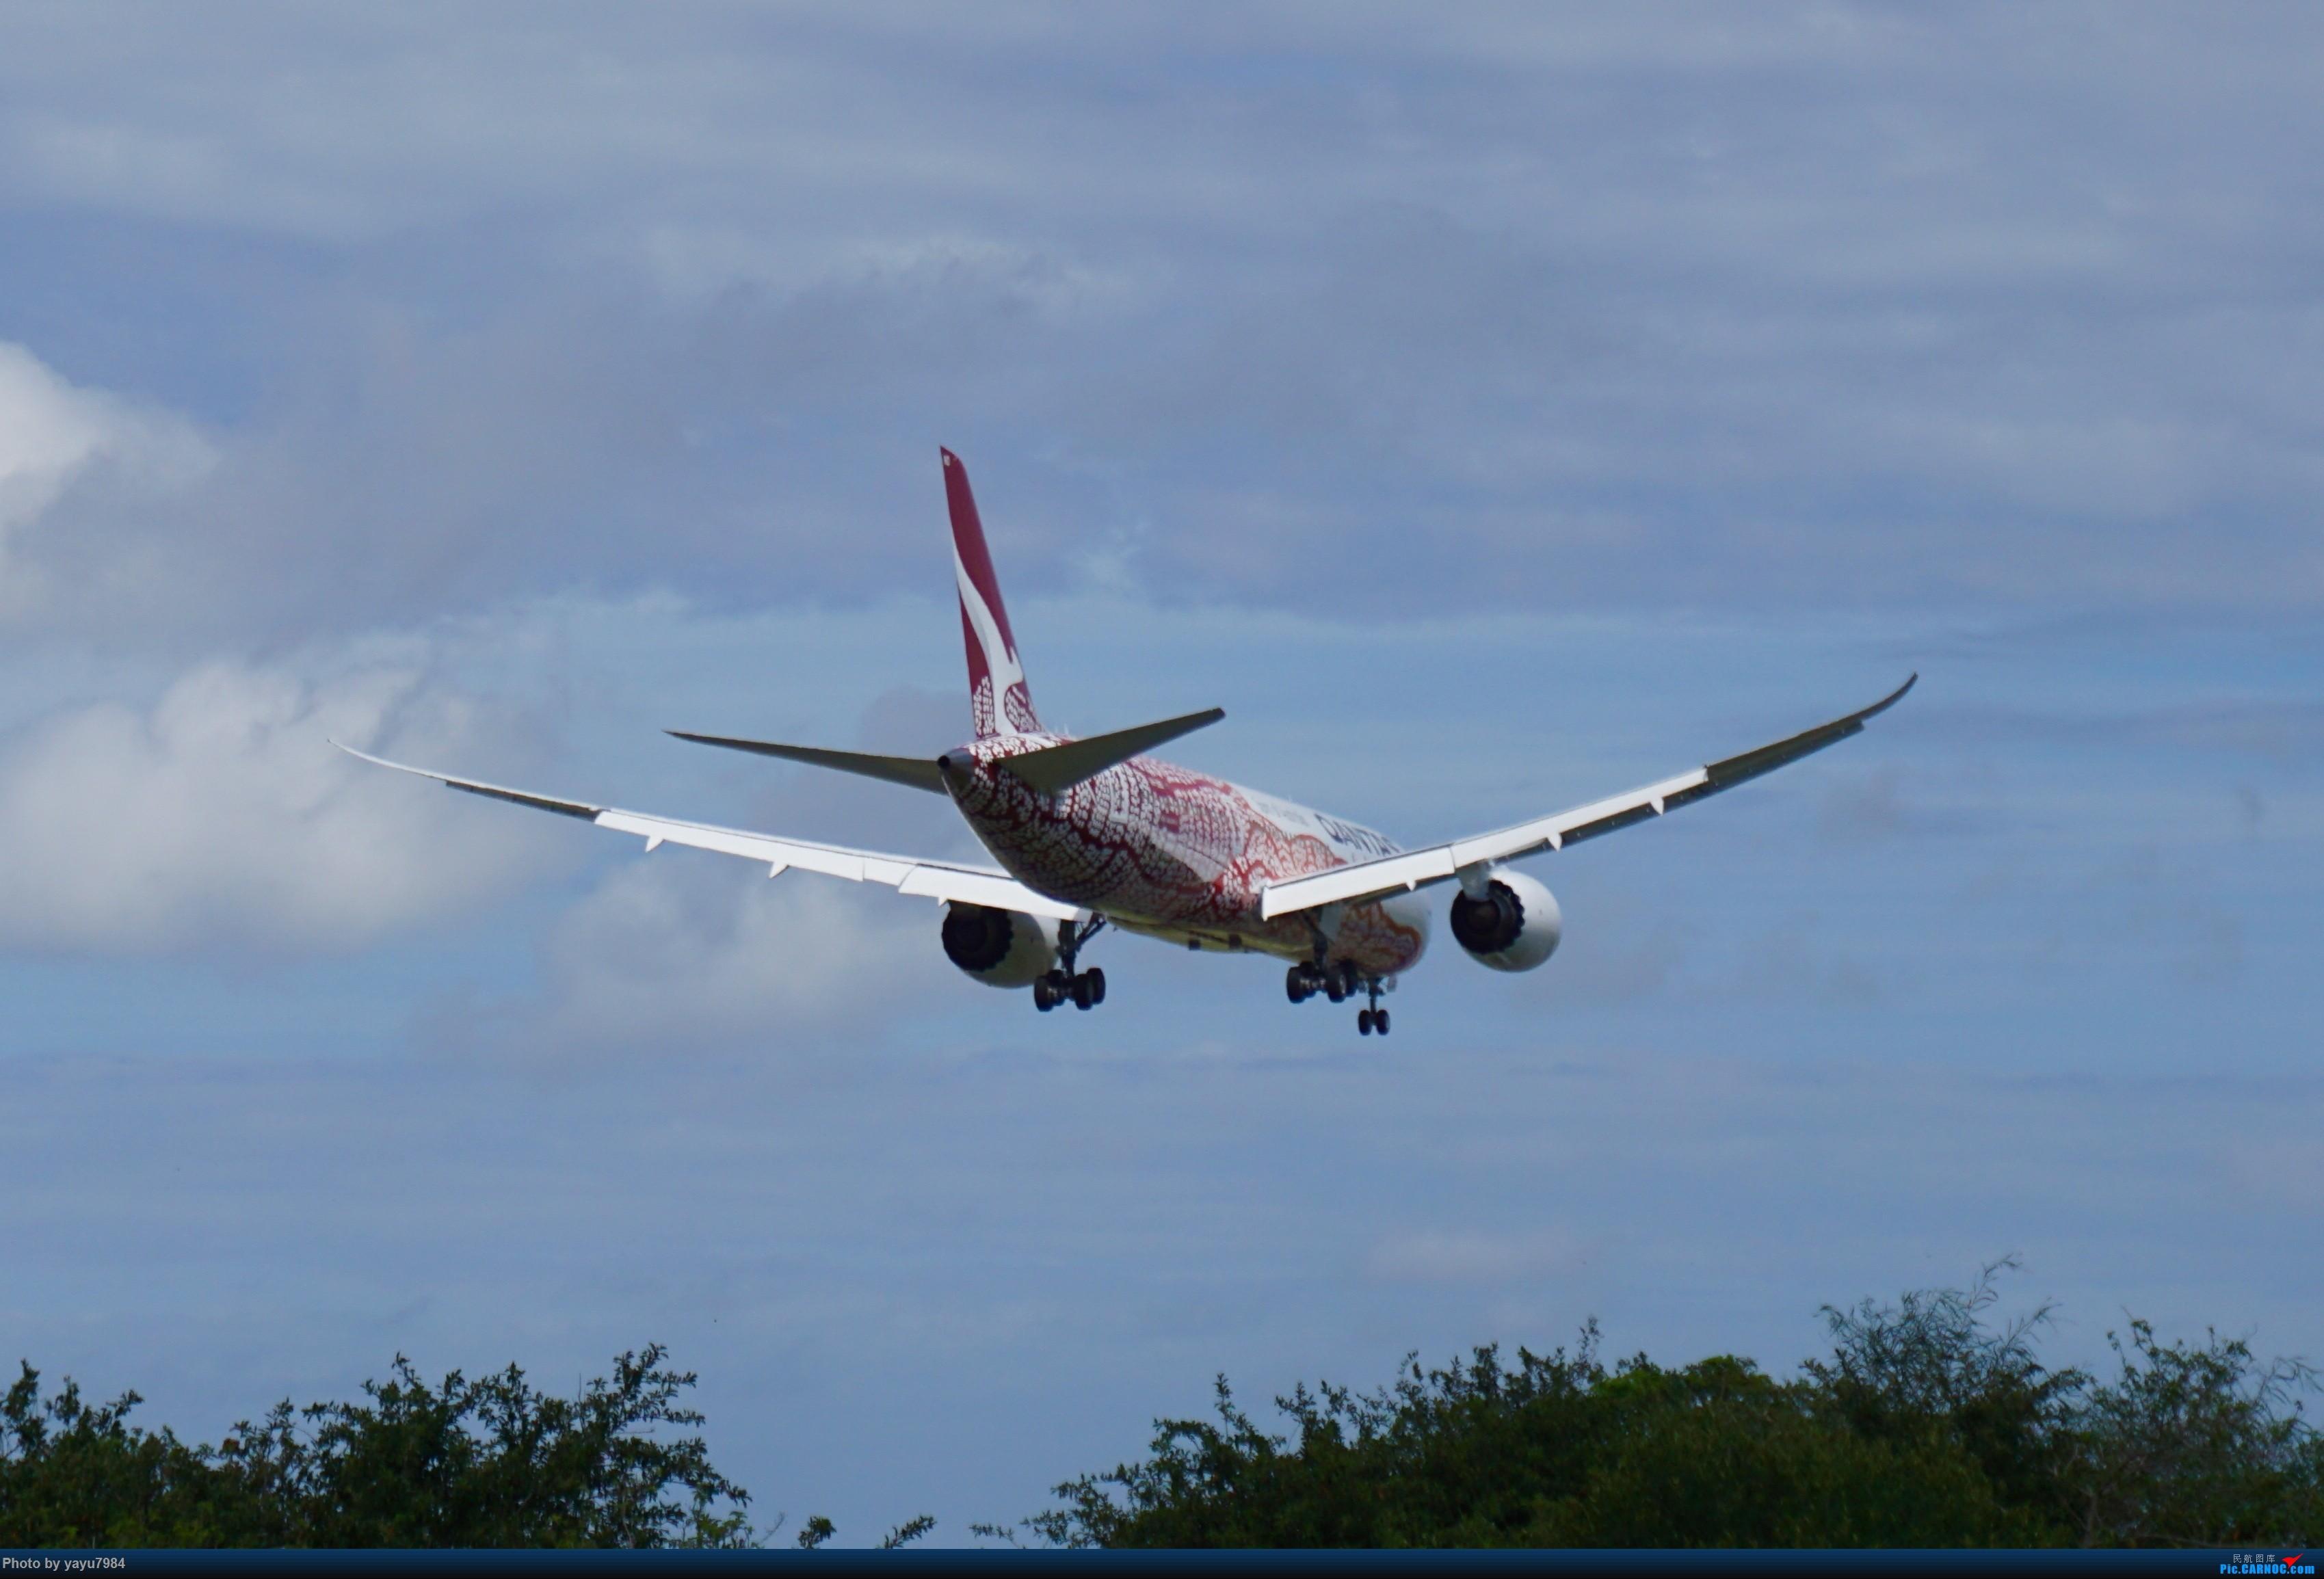 Re:Re:[原创][SYD] 烂天解锁A340-300,顺带其他好货 BOEING 787-9 VH-ZND 澳大利亚悉尼金斯福德·史密斯机场